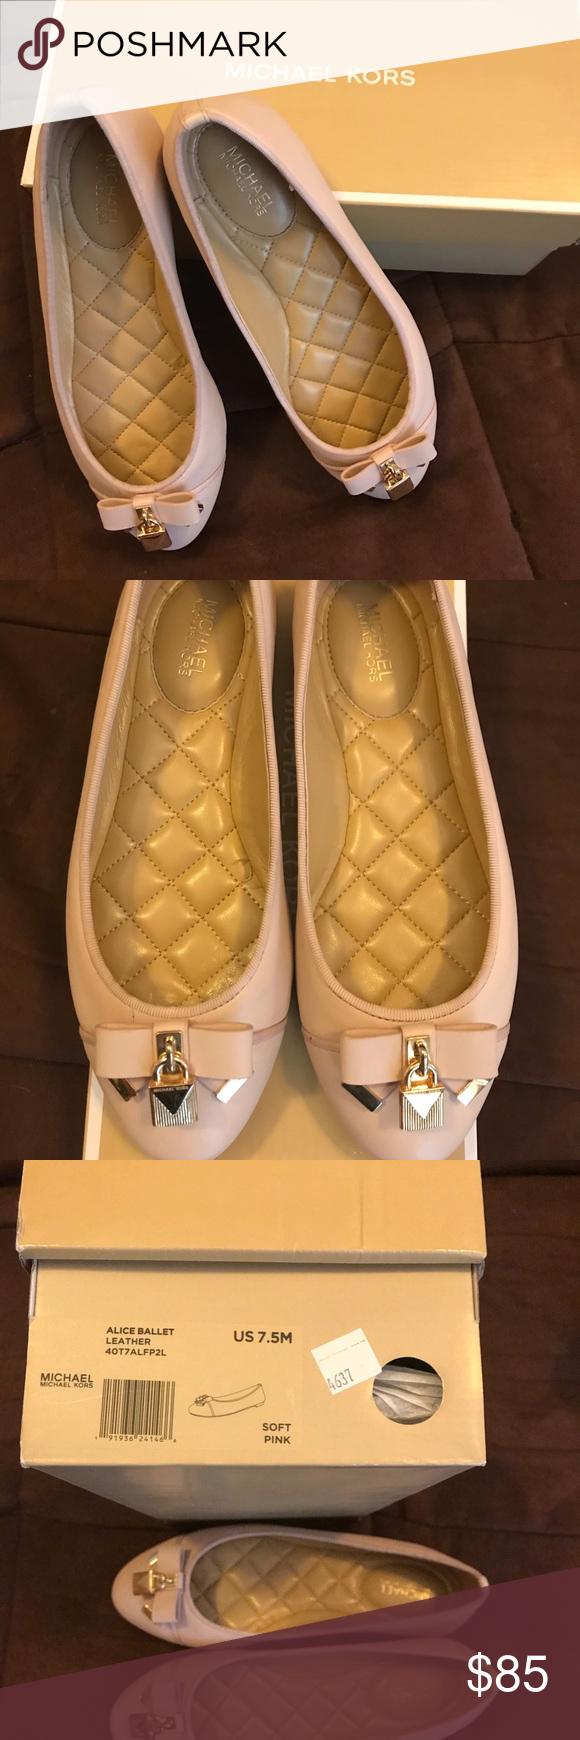 Michael kors ballet shoes